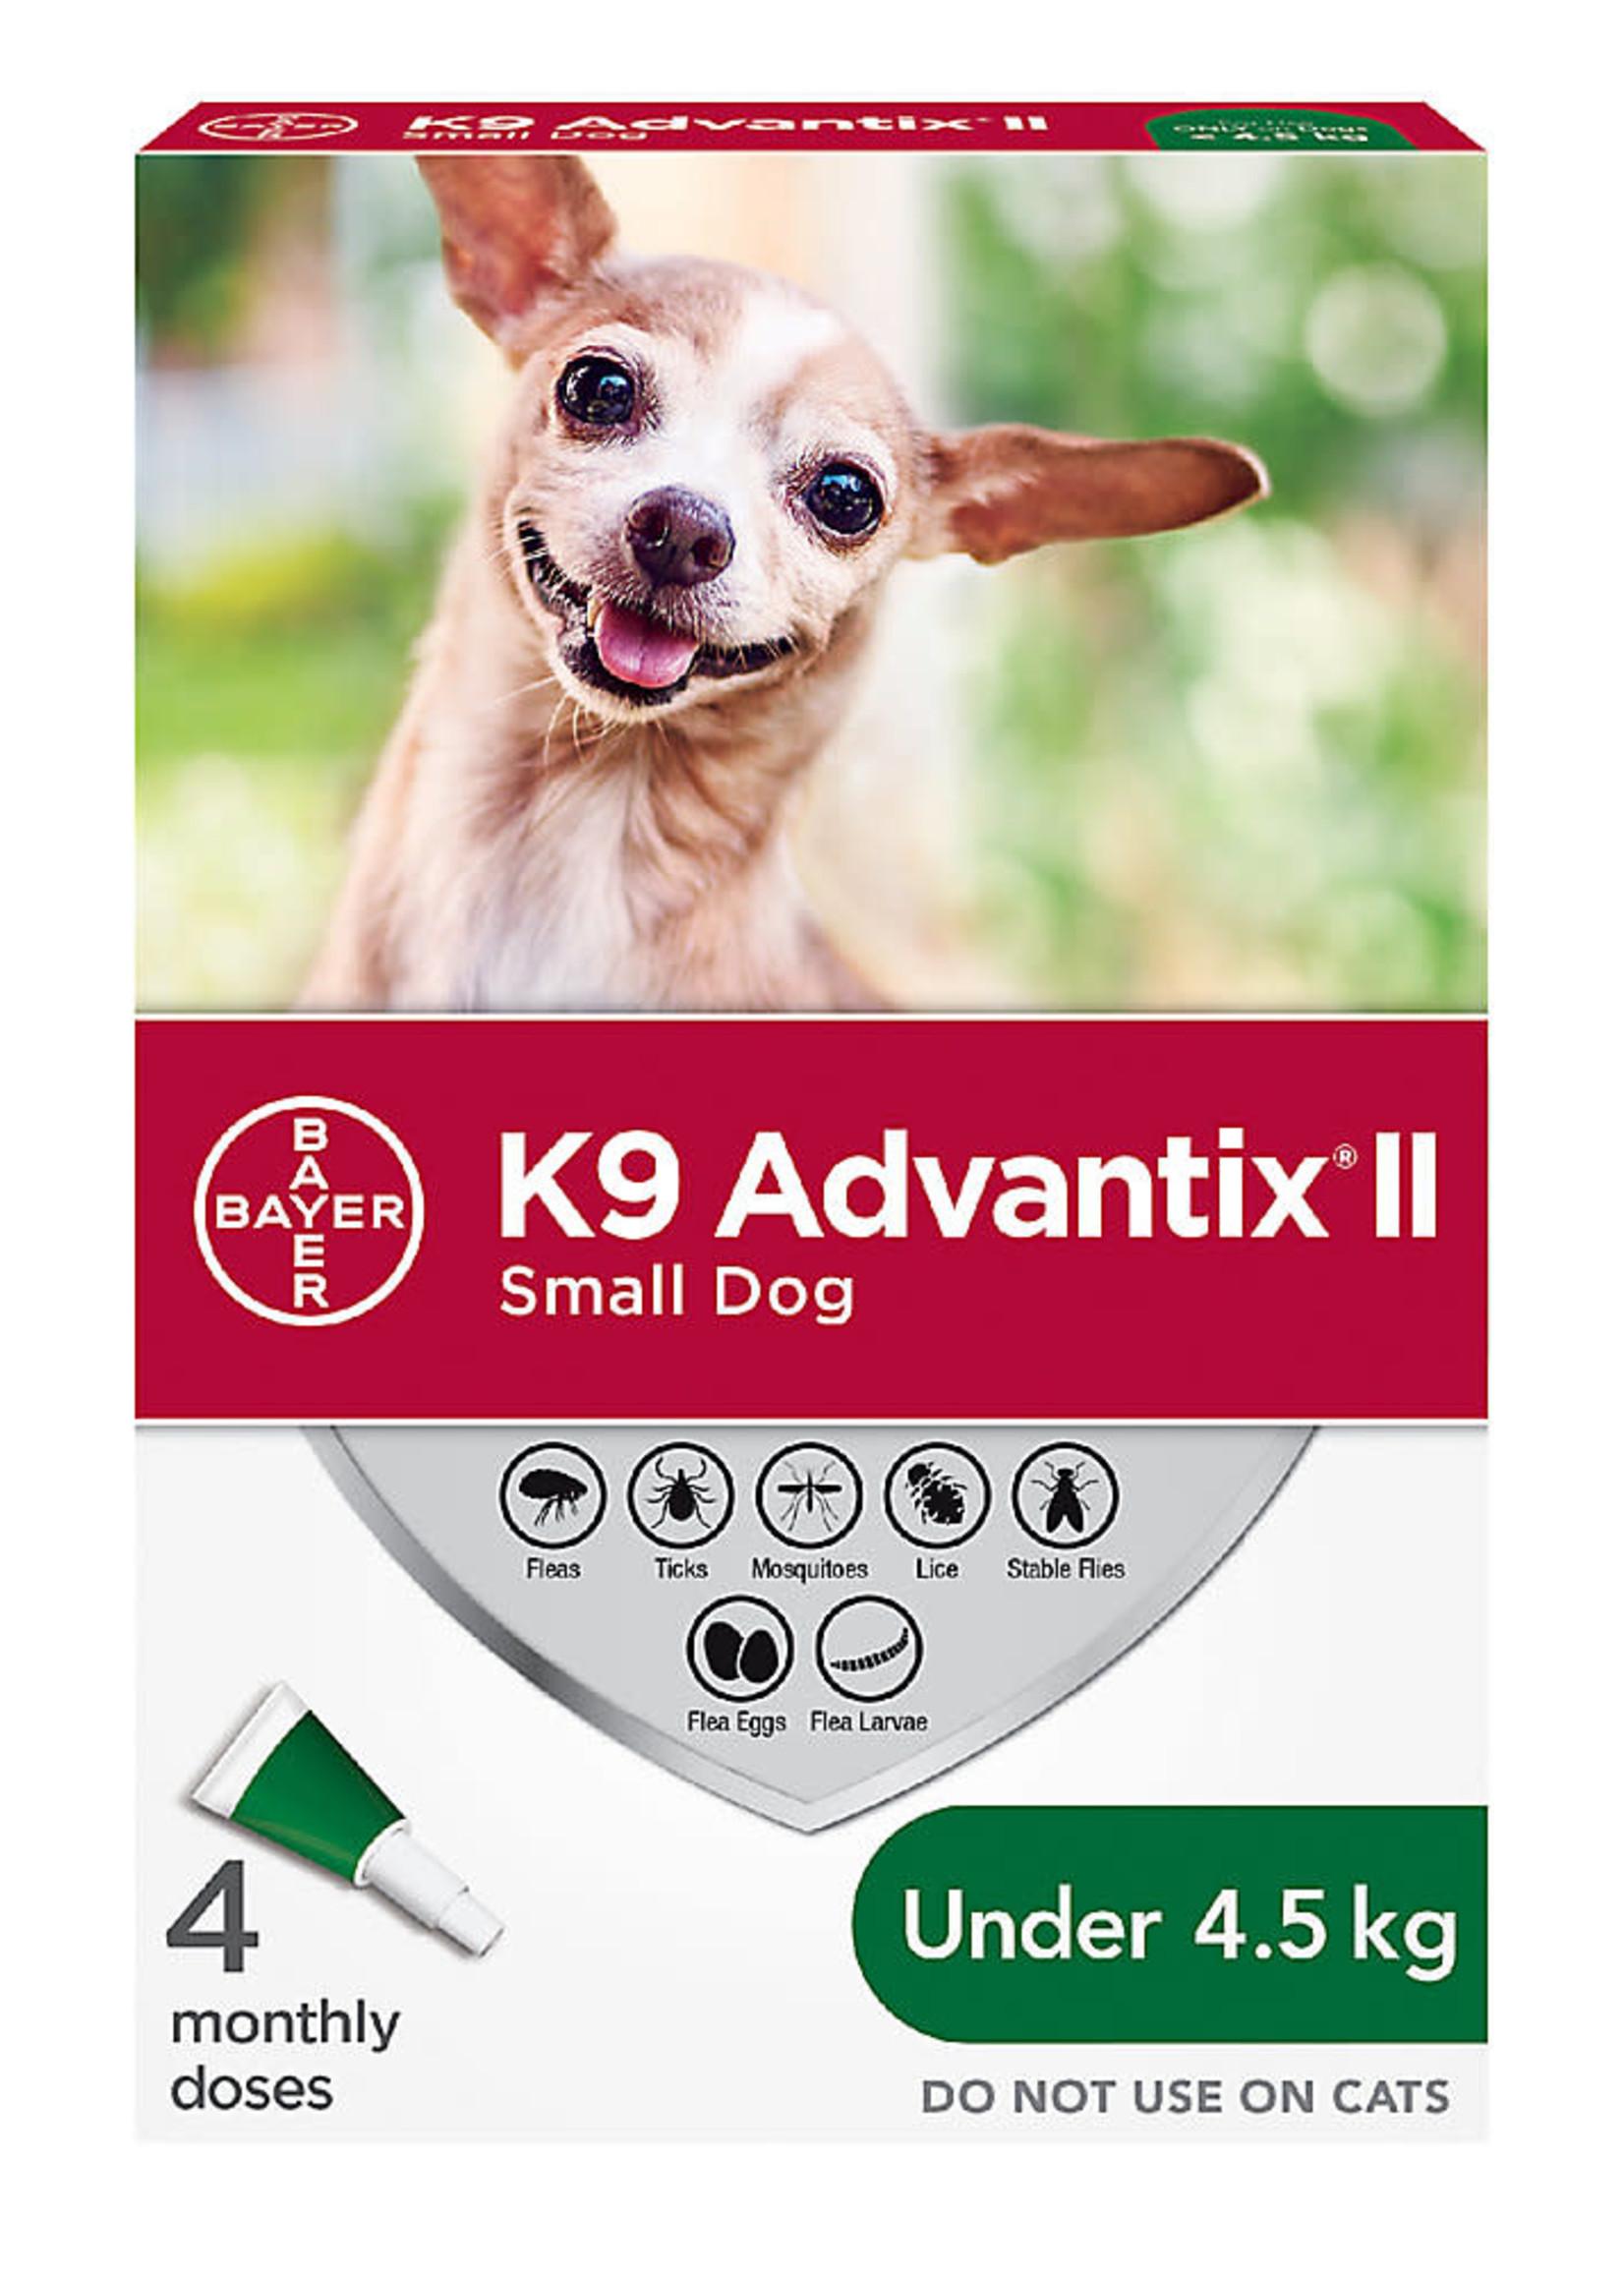 Bayer K9 Advantix® II - Small Dog